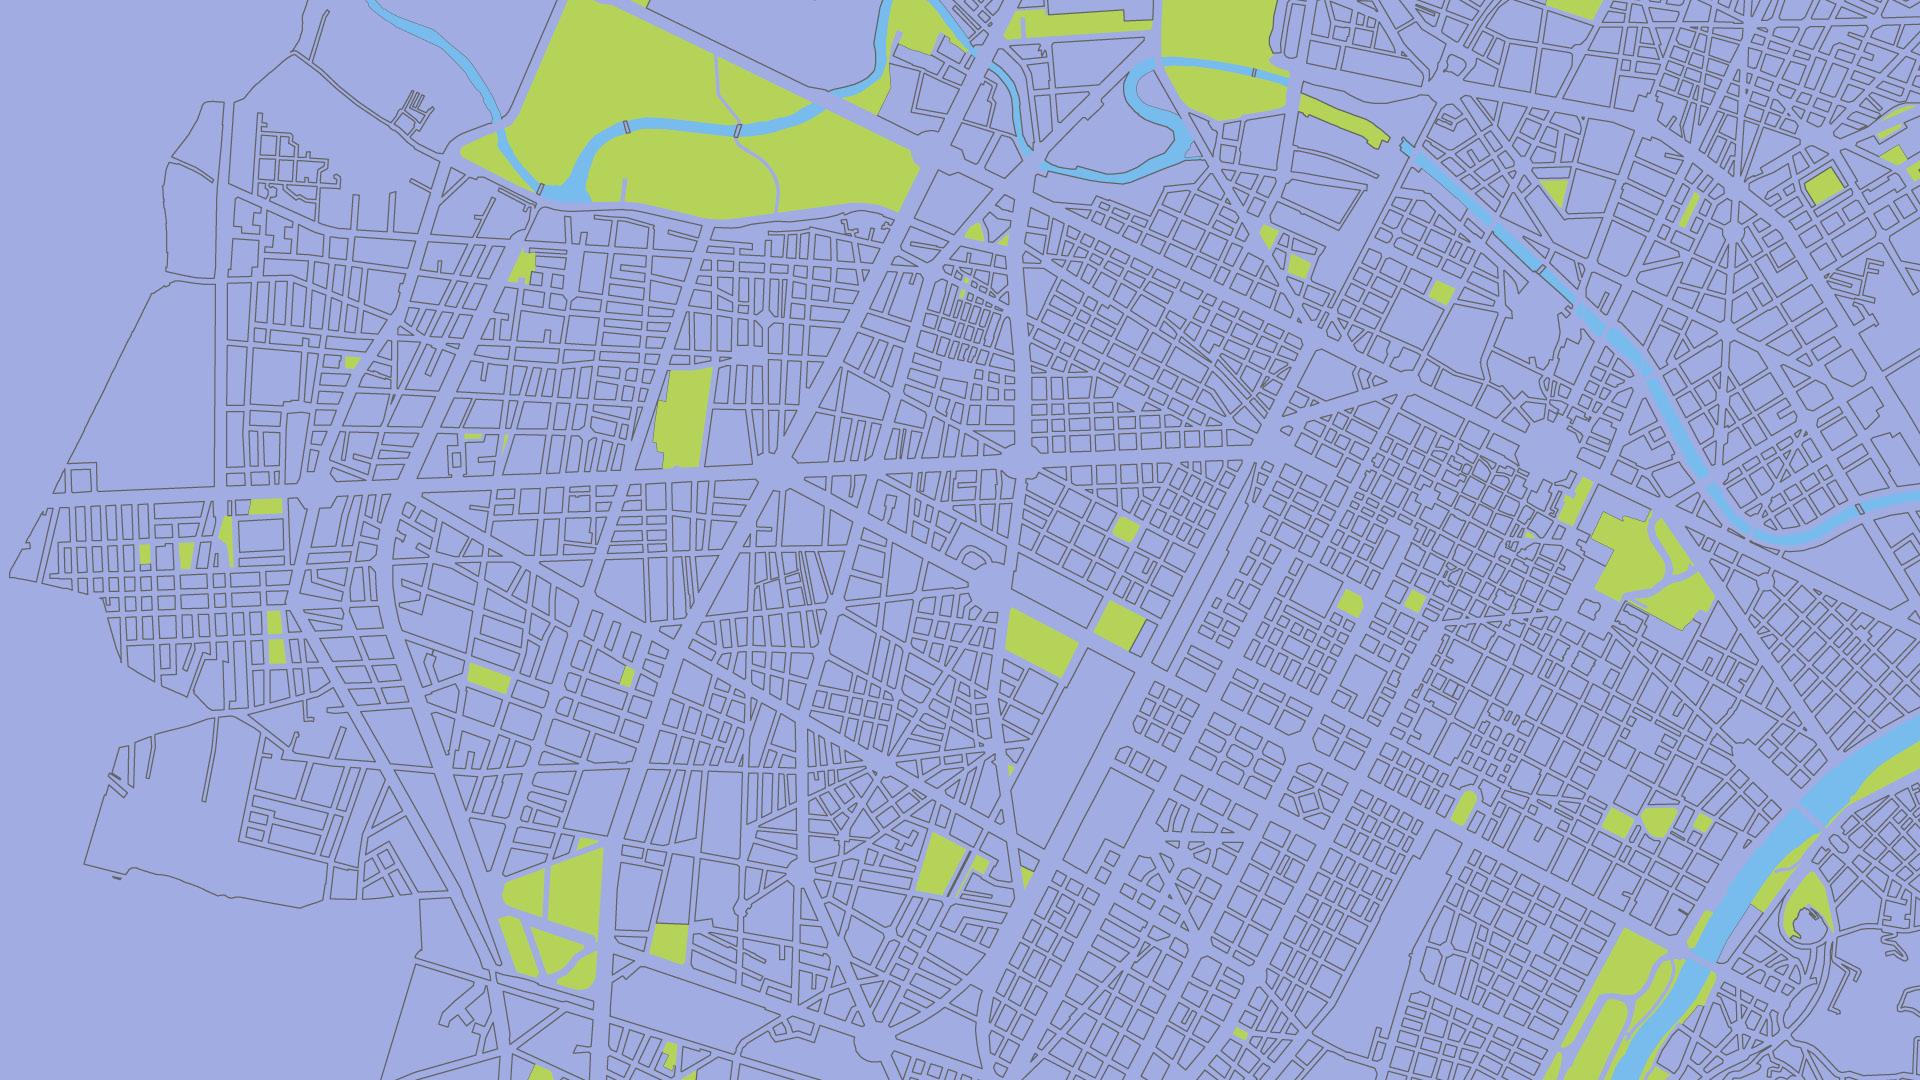 Visiting Urban Explorer #3 – Justyna Król